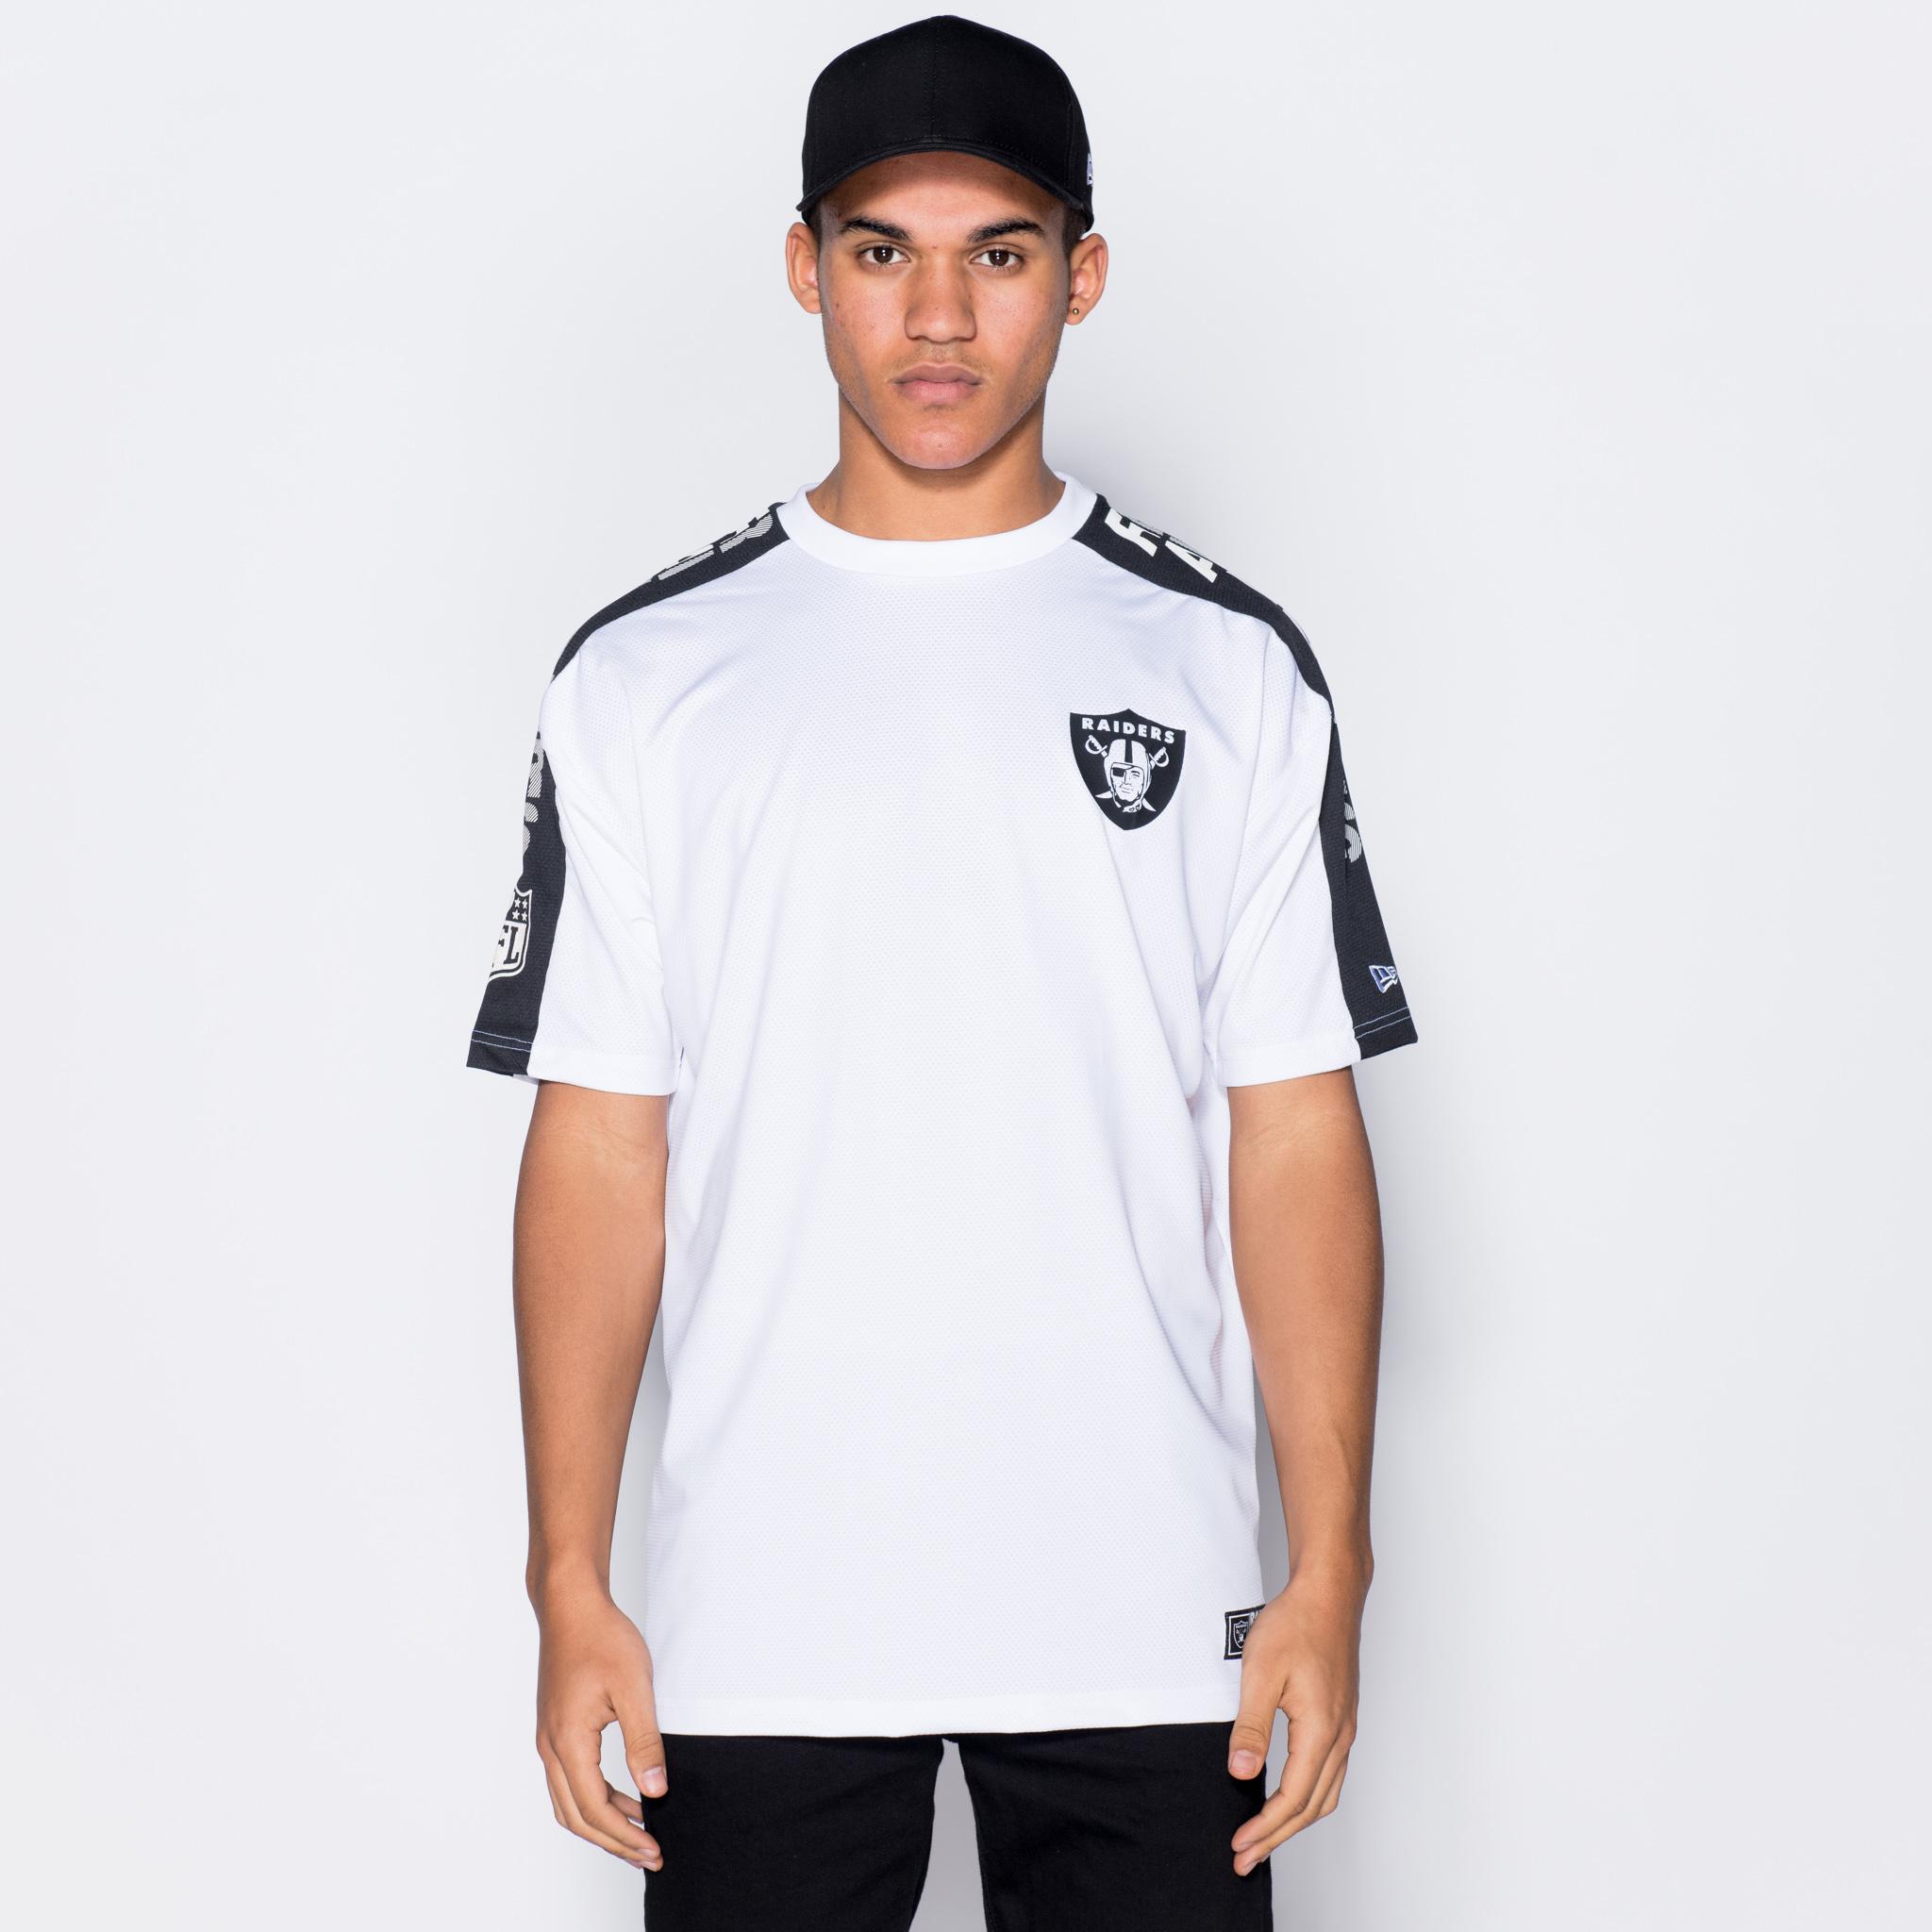 Camiseta Oakland Raiders Oversized Shoulder Print